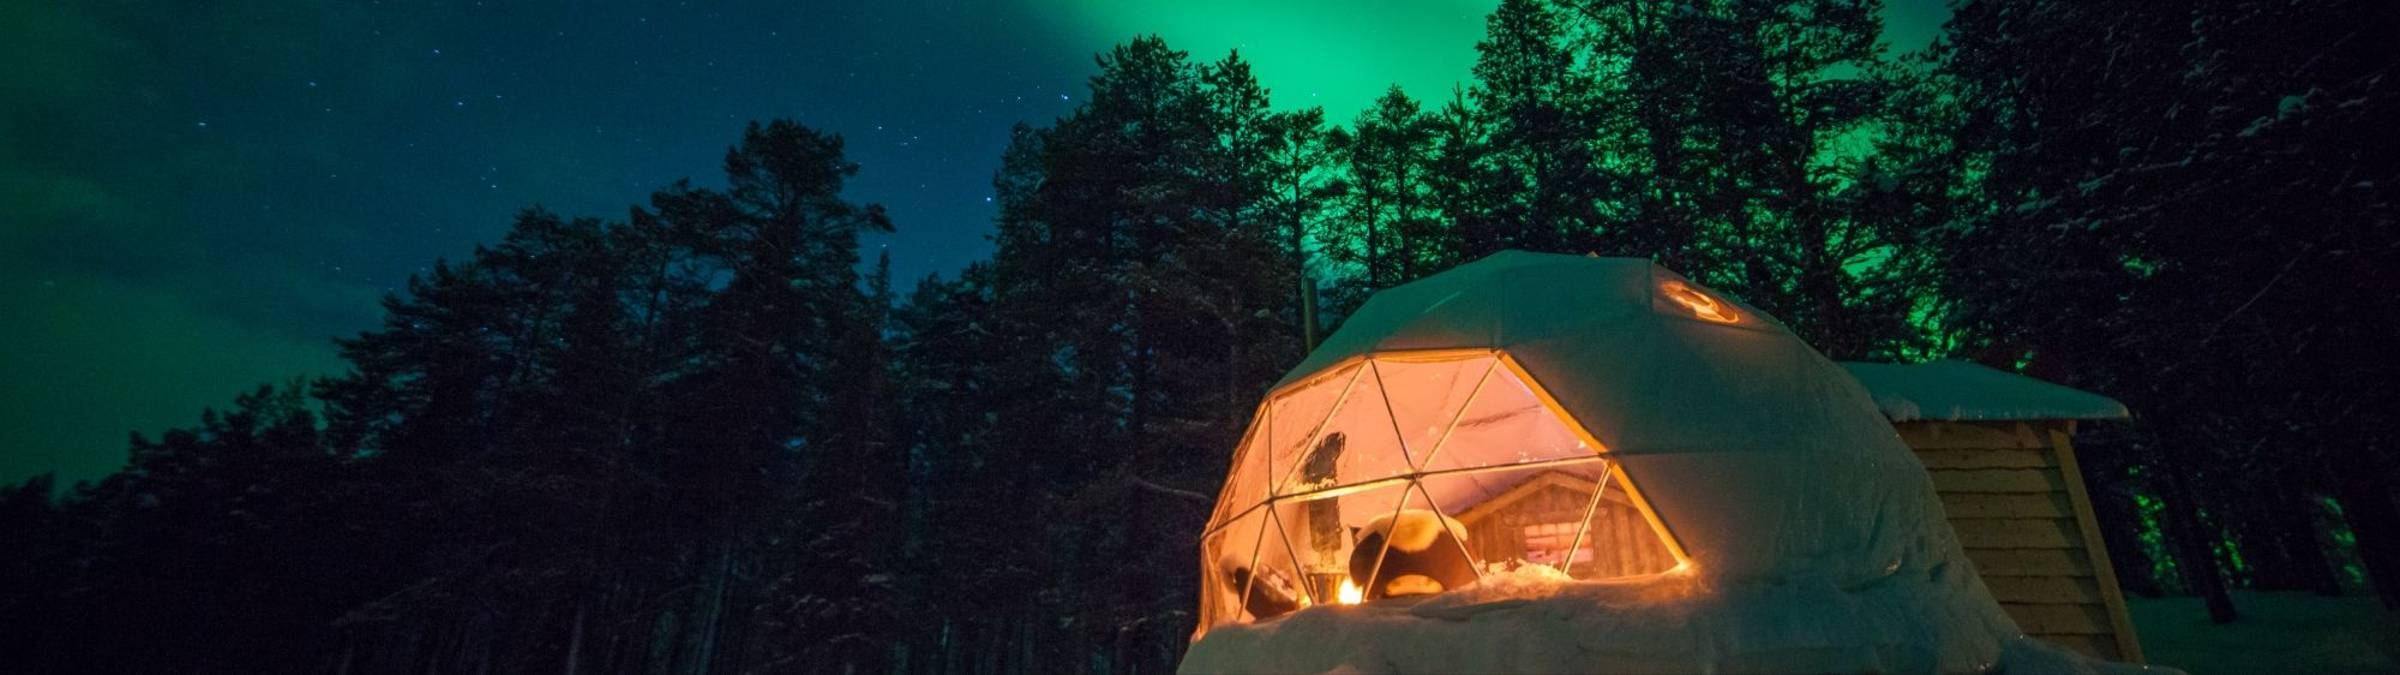 Aurora Dome Credit Antti Pietikäinen